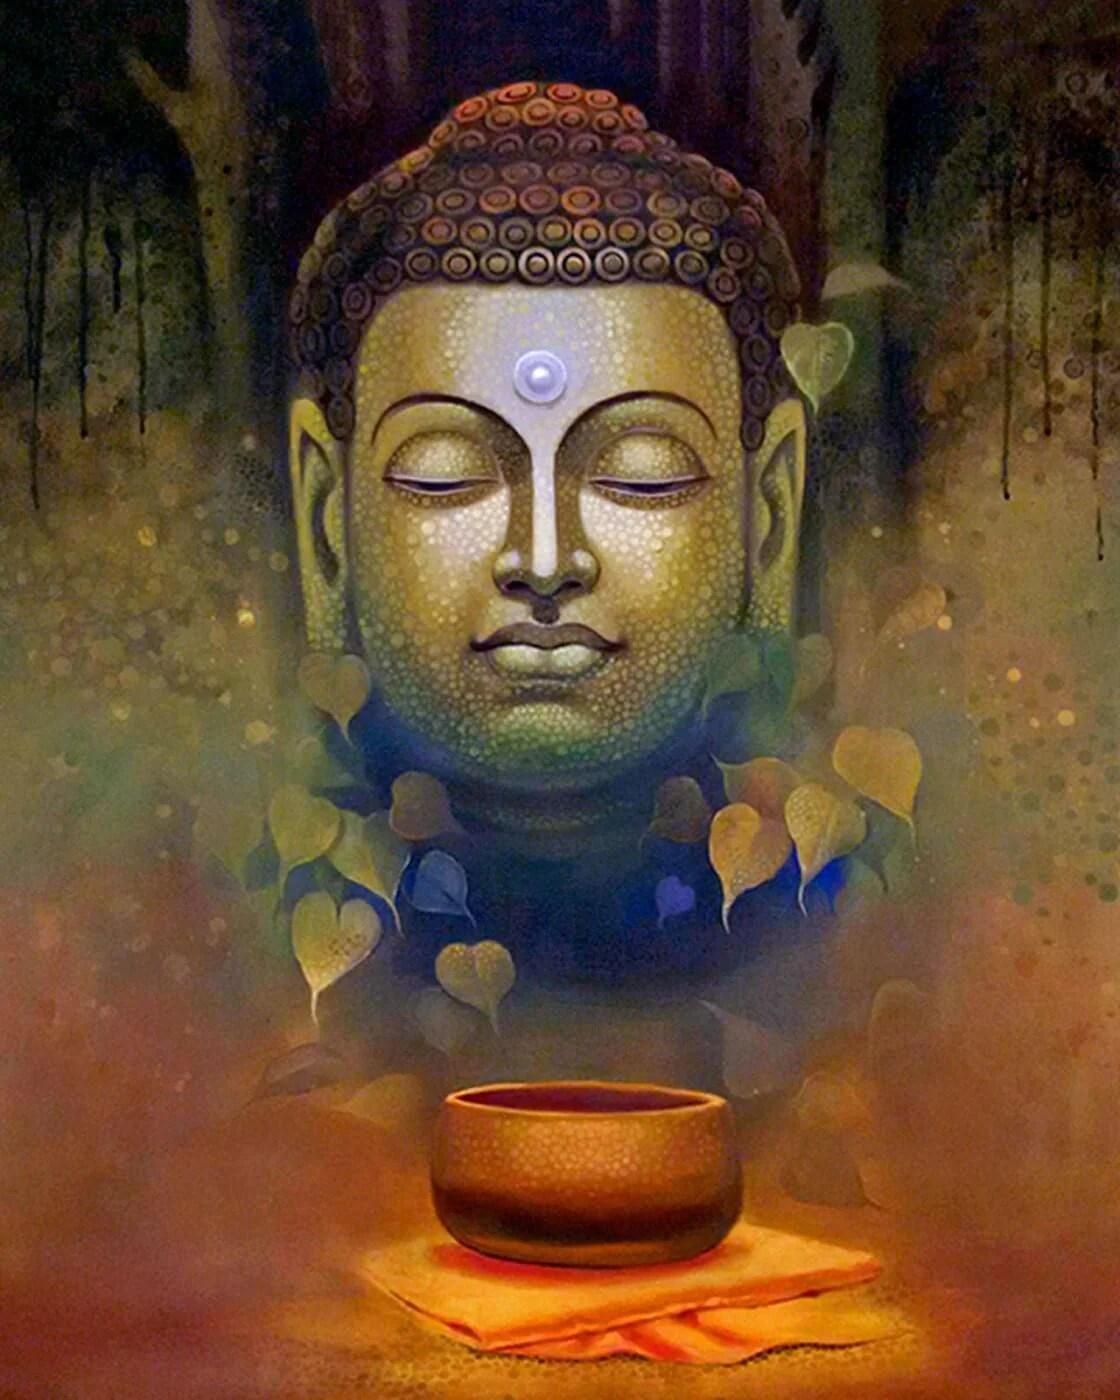 Gautam Buddha Art Art Prints By Anzai Buy Posters Frames Canvas Digital Art Prints Small Compact Medium And Large Variants